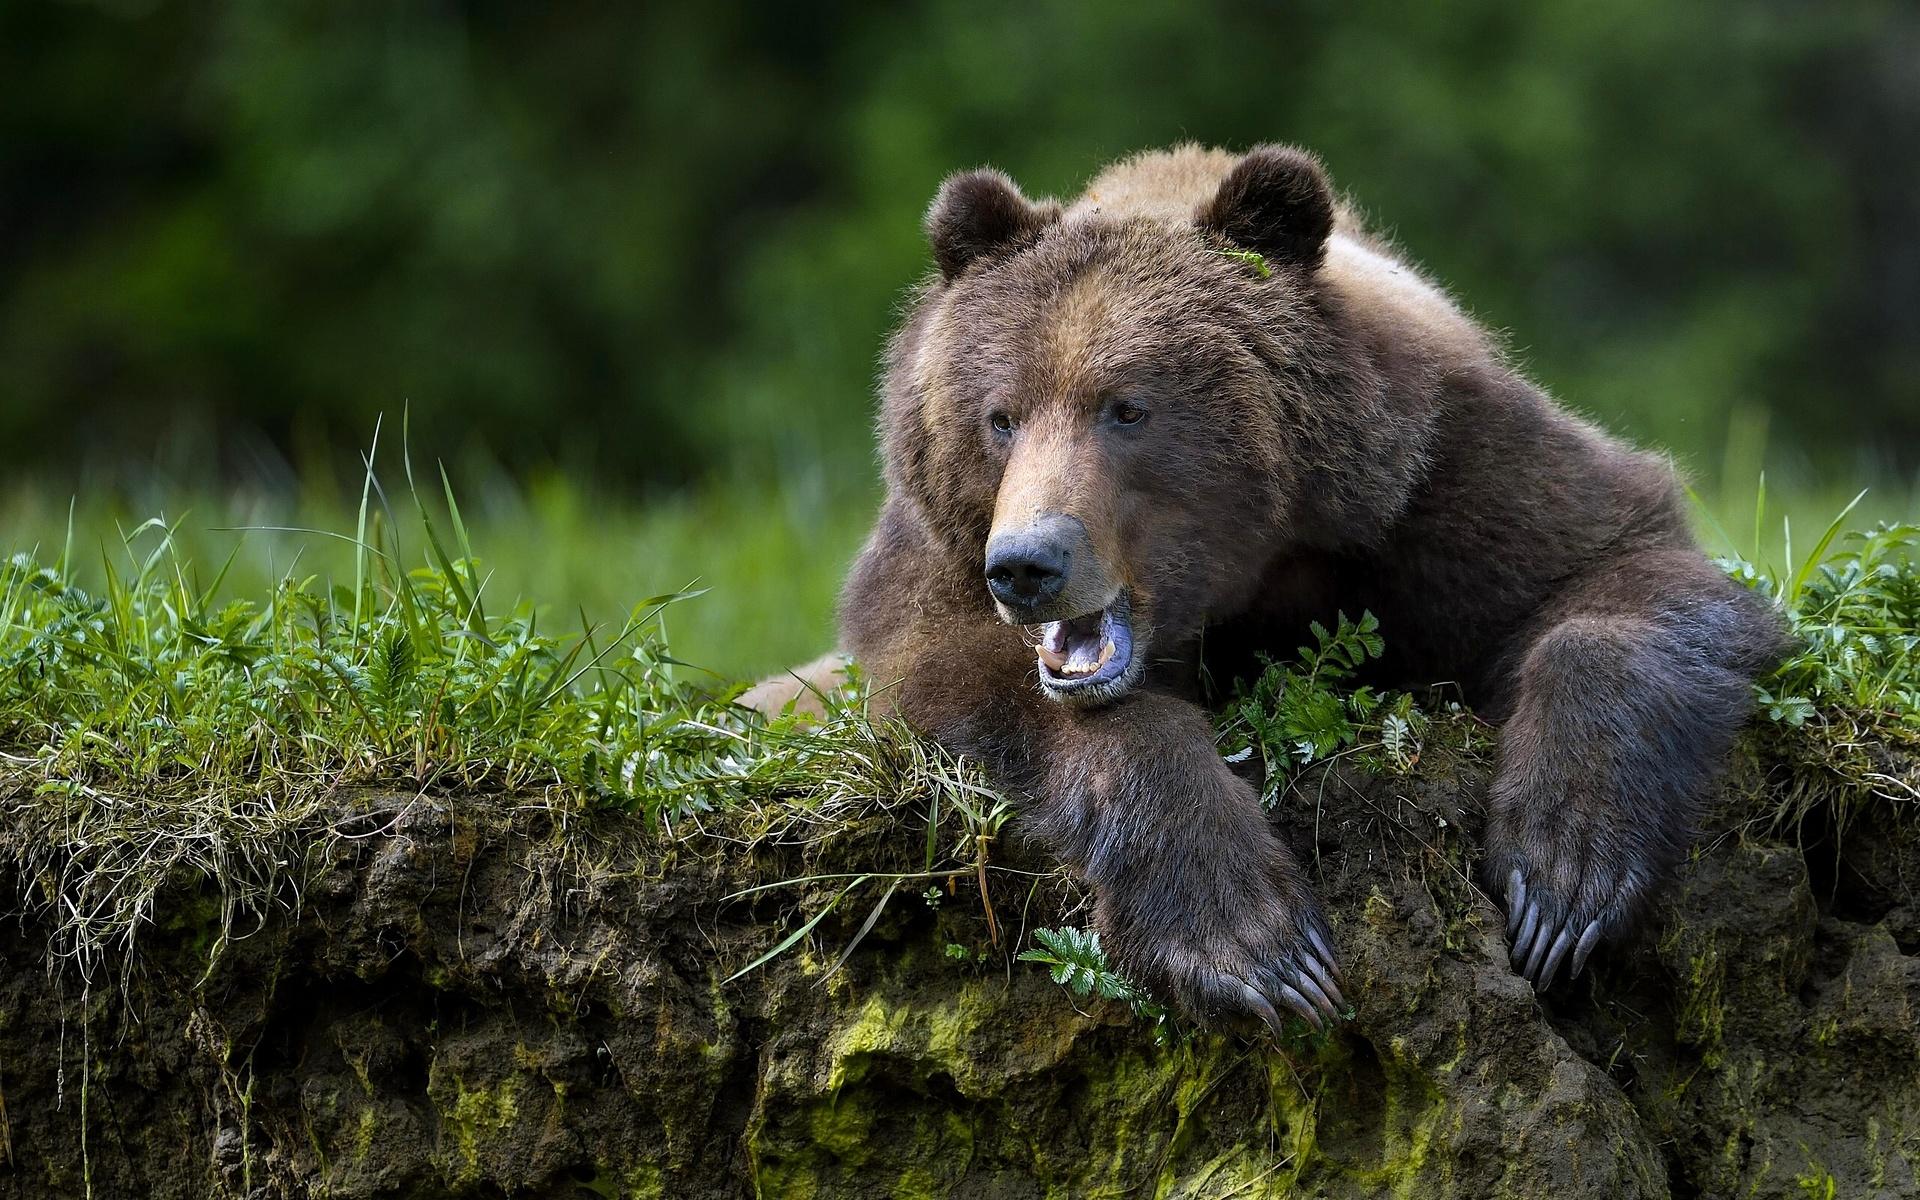 Cri ours brun - Fond d'écran HD